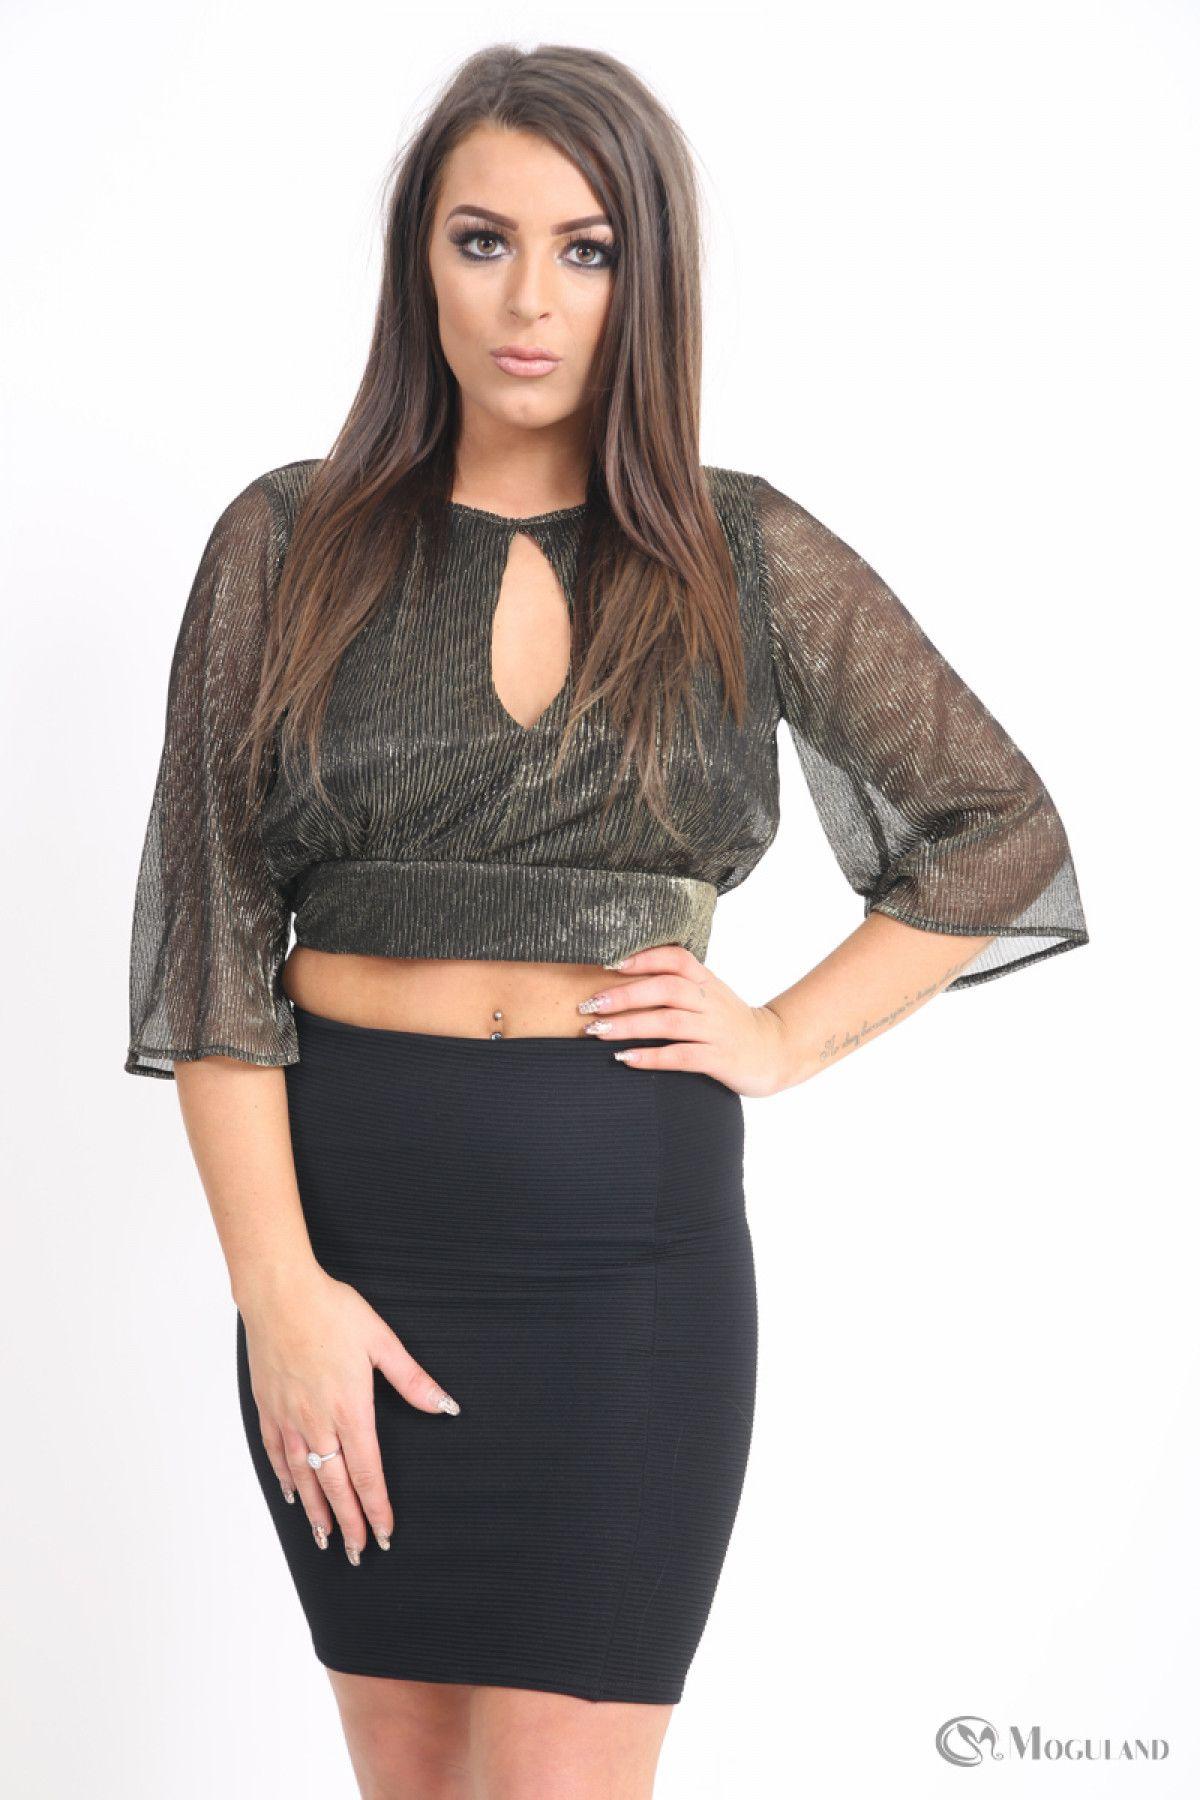 50c7261c30 Ladies black shimmer open back top wholesale - Women s Wholesale Clothing  Supplier